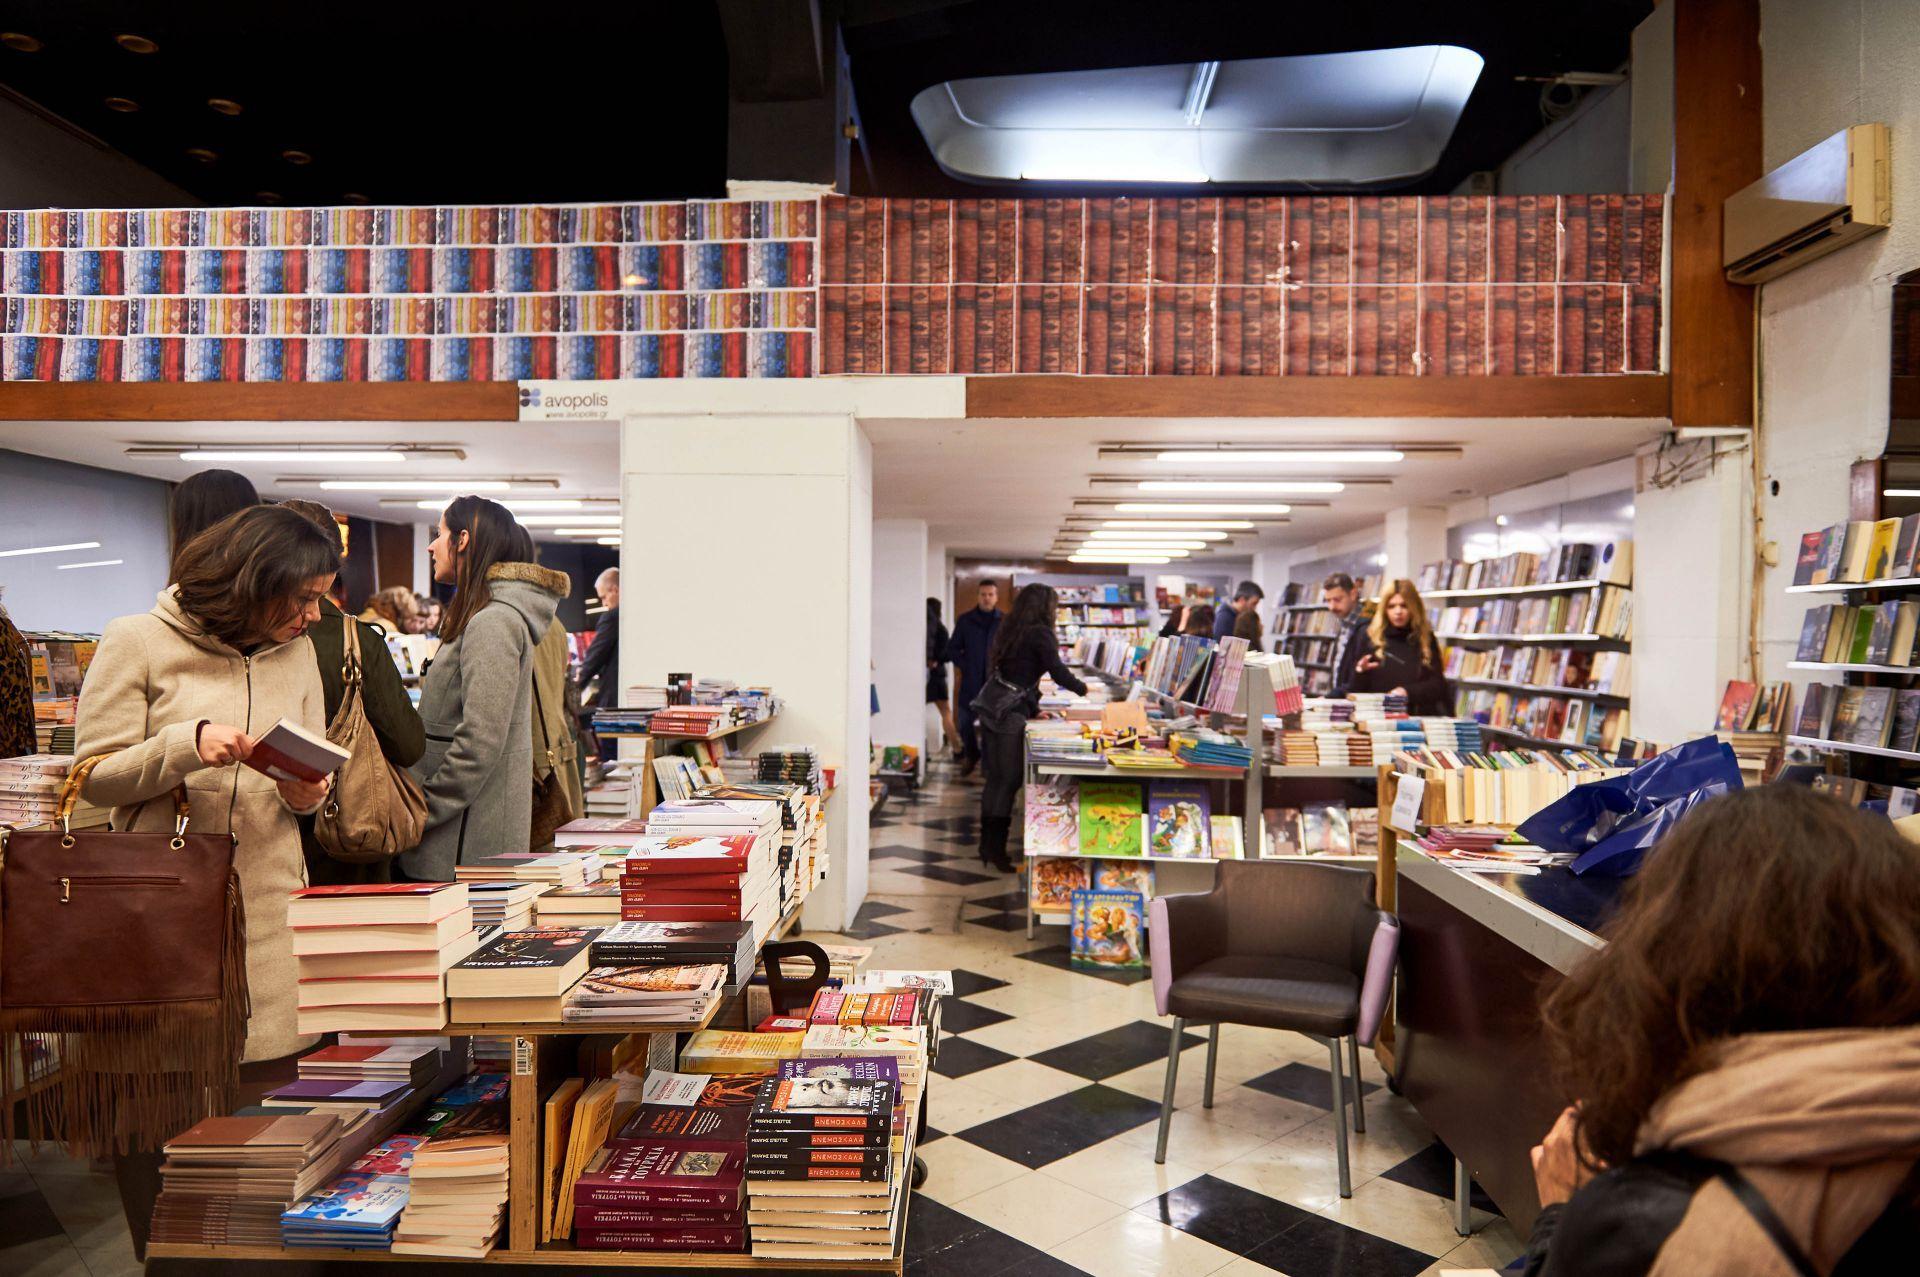 Shop books in Greece